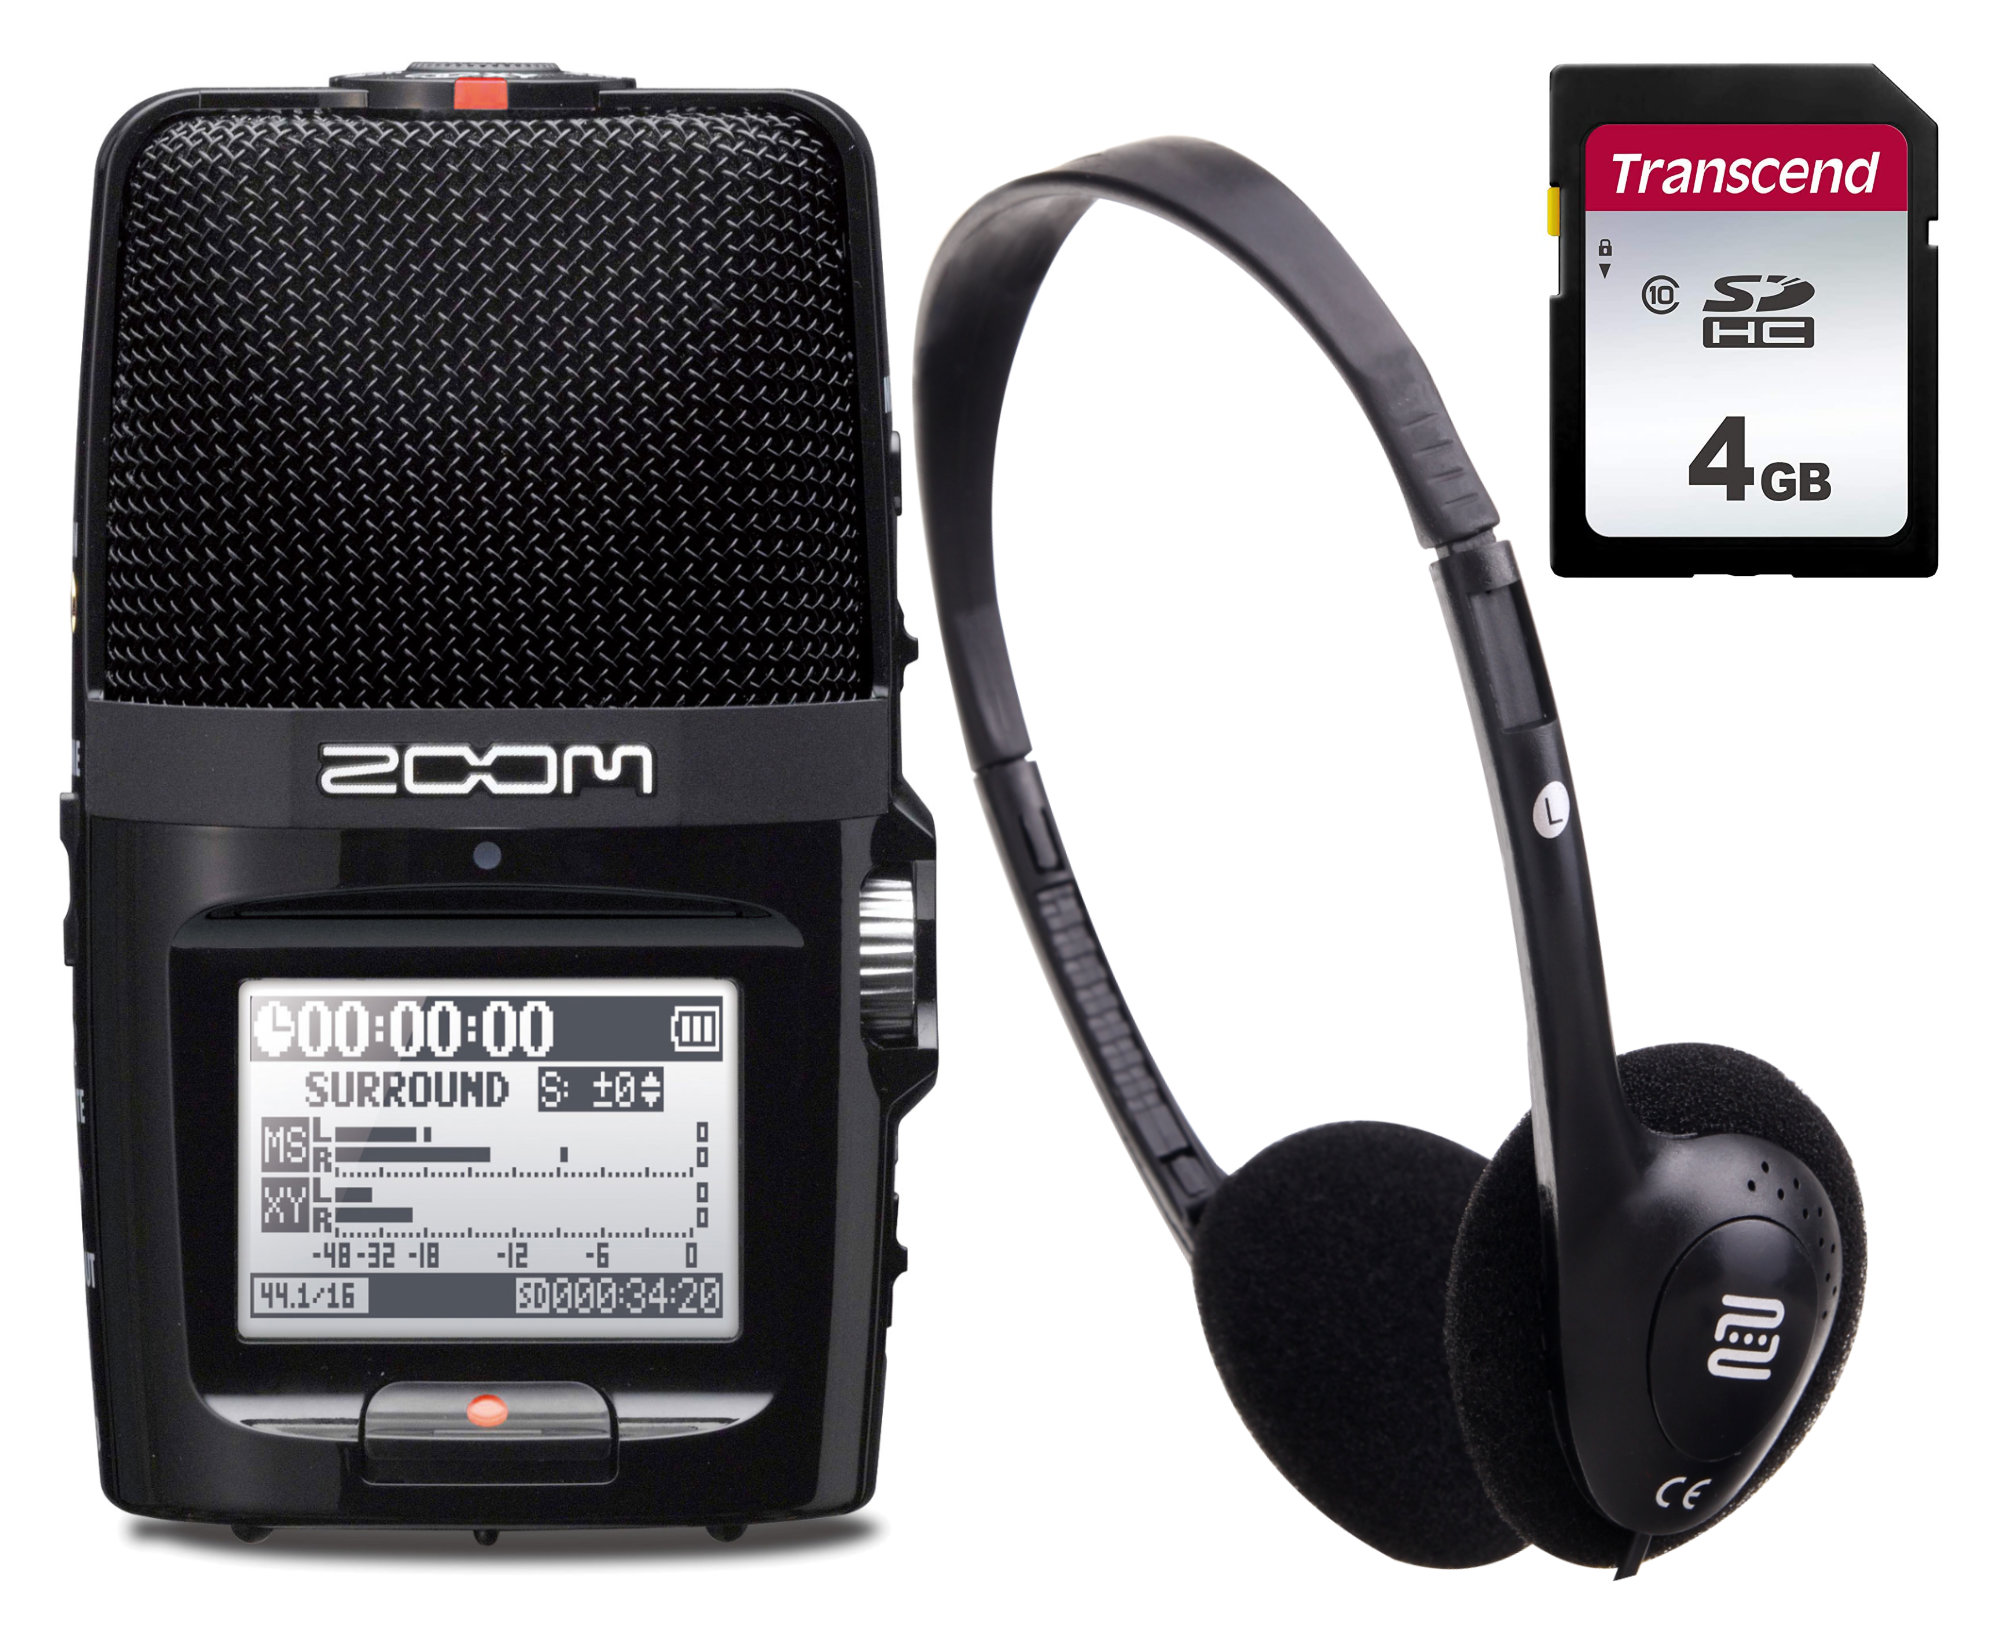 Zoom H2n SET inkl. Kopfhörer und 4 GB SDHC-Karte